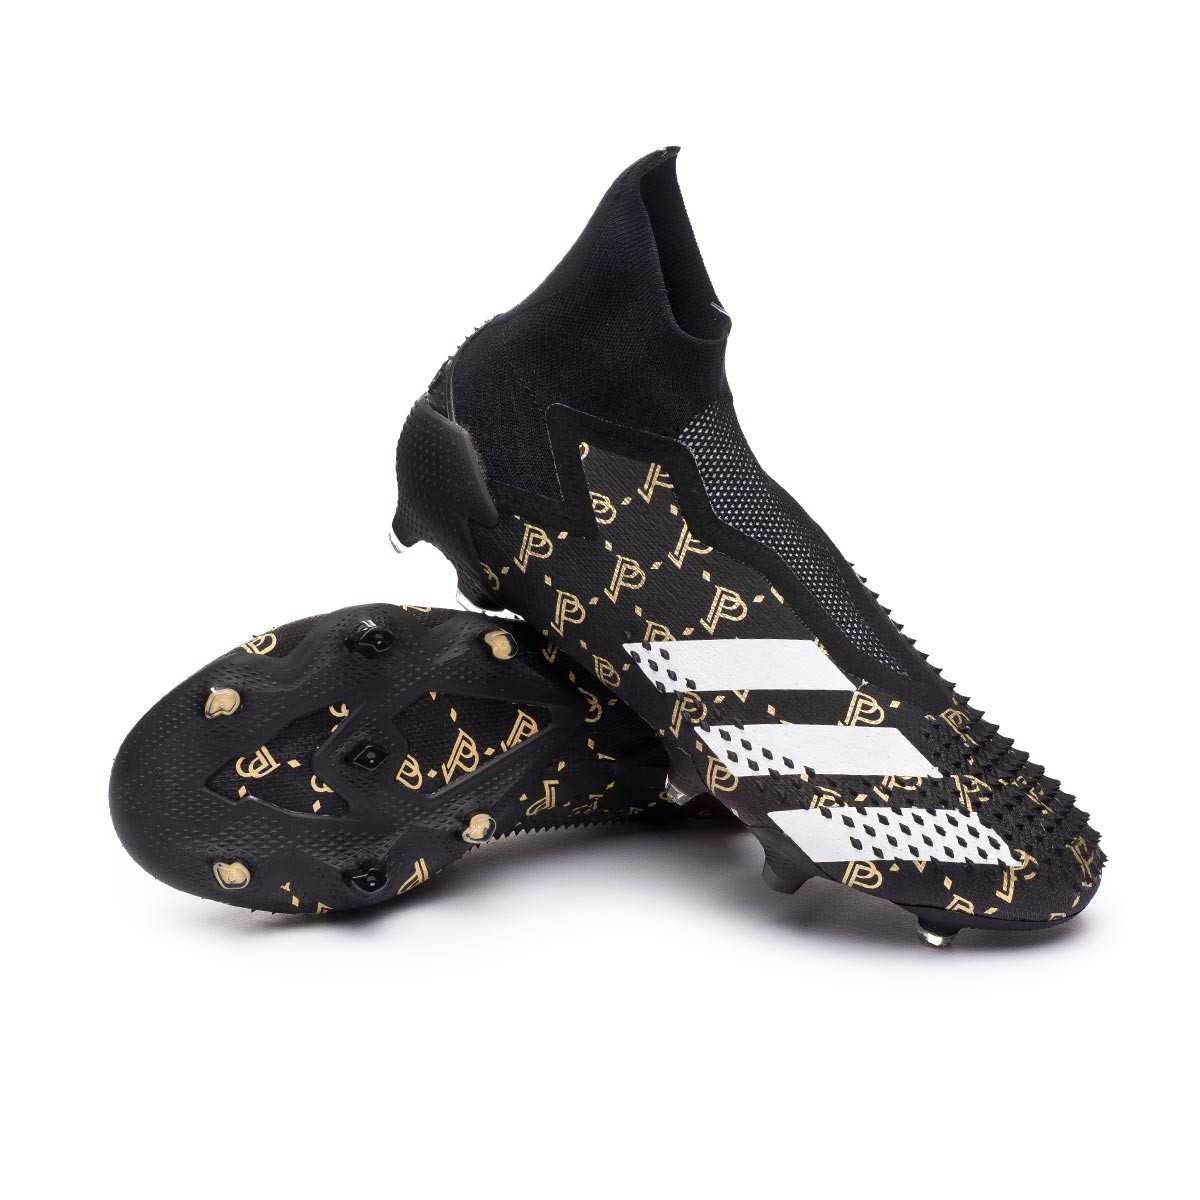 Resonar servilleta Escabullirse  Zapatos de fútbol adidas Predator 20+ Paul Pogba FG Core black-White-Gold  metallic - Tienda de fútbol Fútbol Emotion